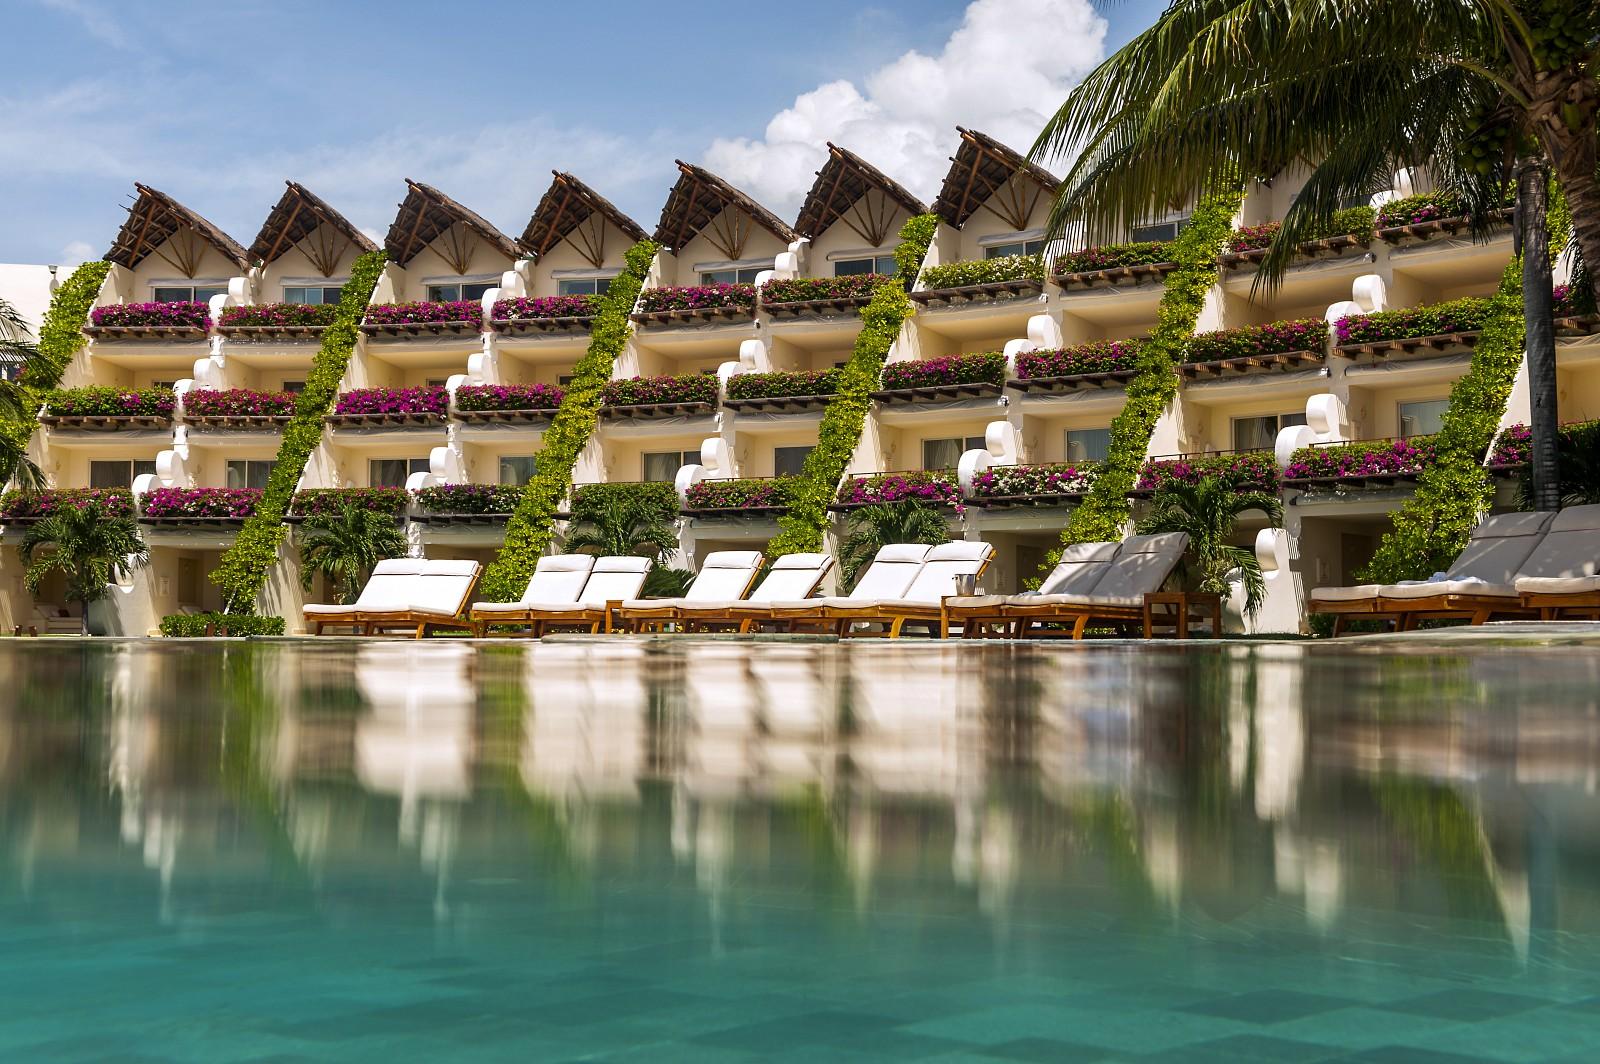 Travel Agency All-Inclusive Resort Grand Velas Riviera Maya 001